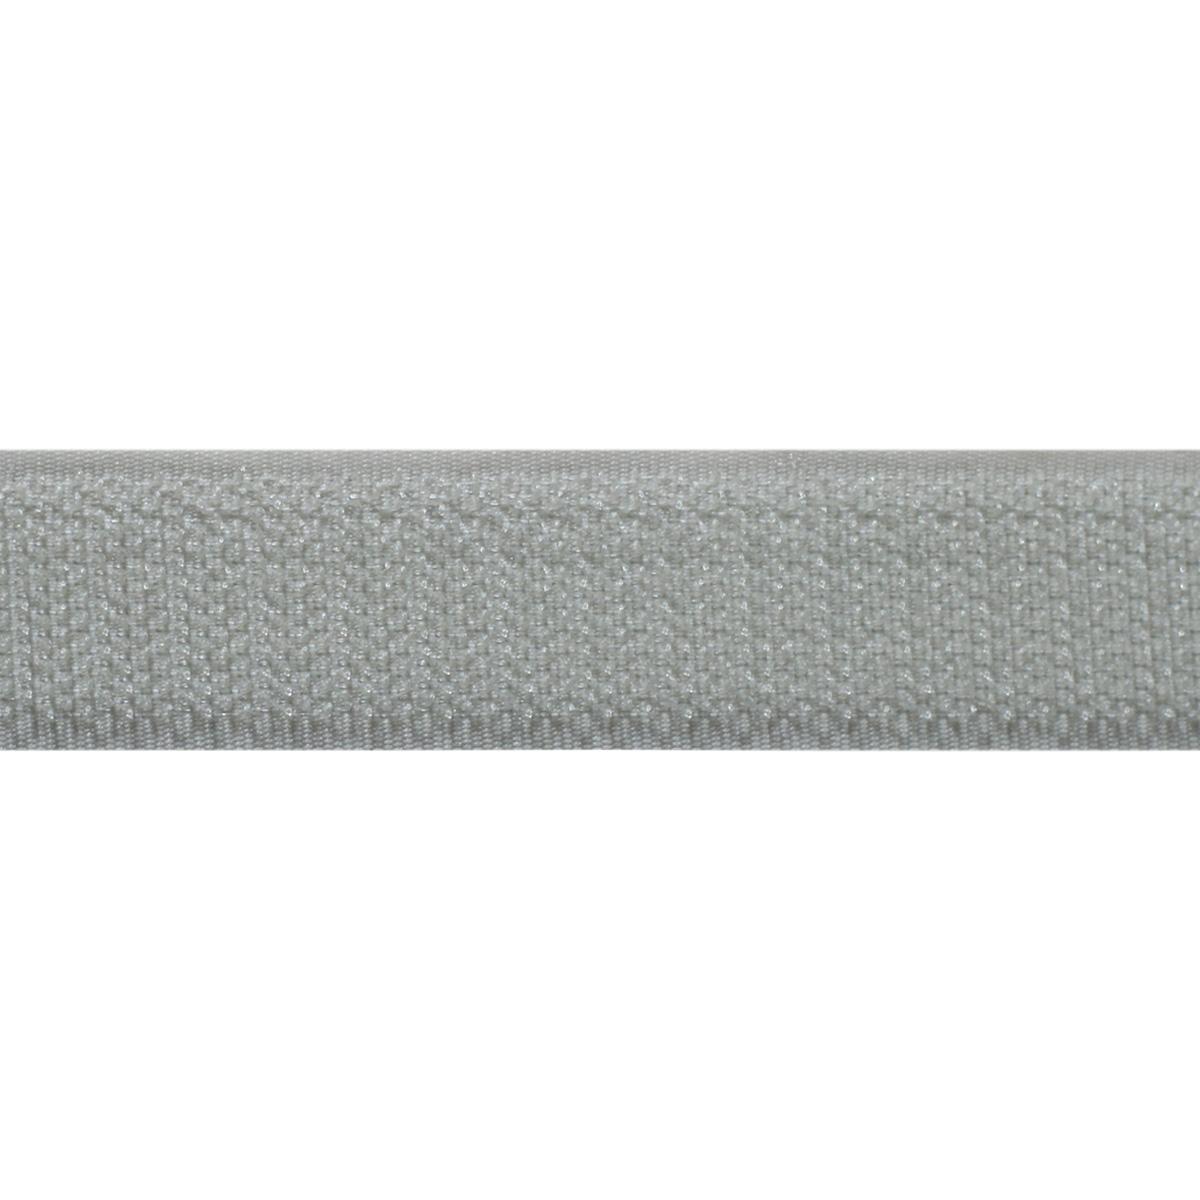 20070 Лента контактная 20мм.25 м 'крючок' (17 св.серый) ГР